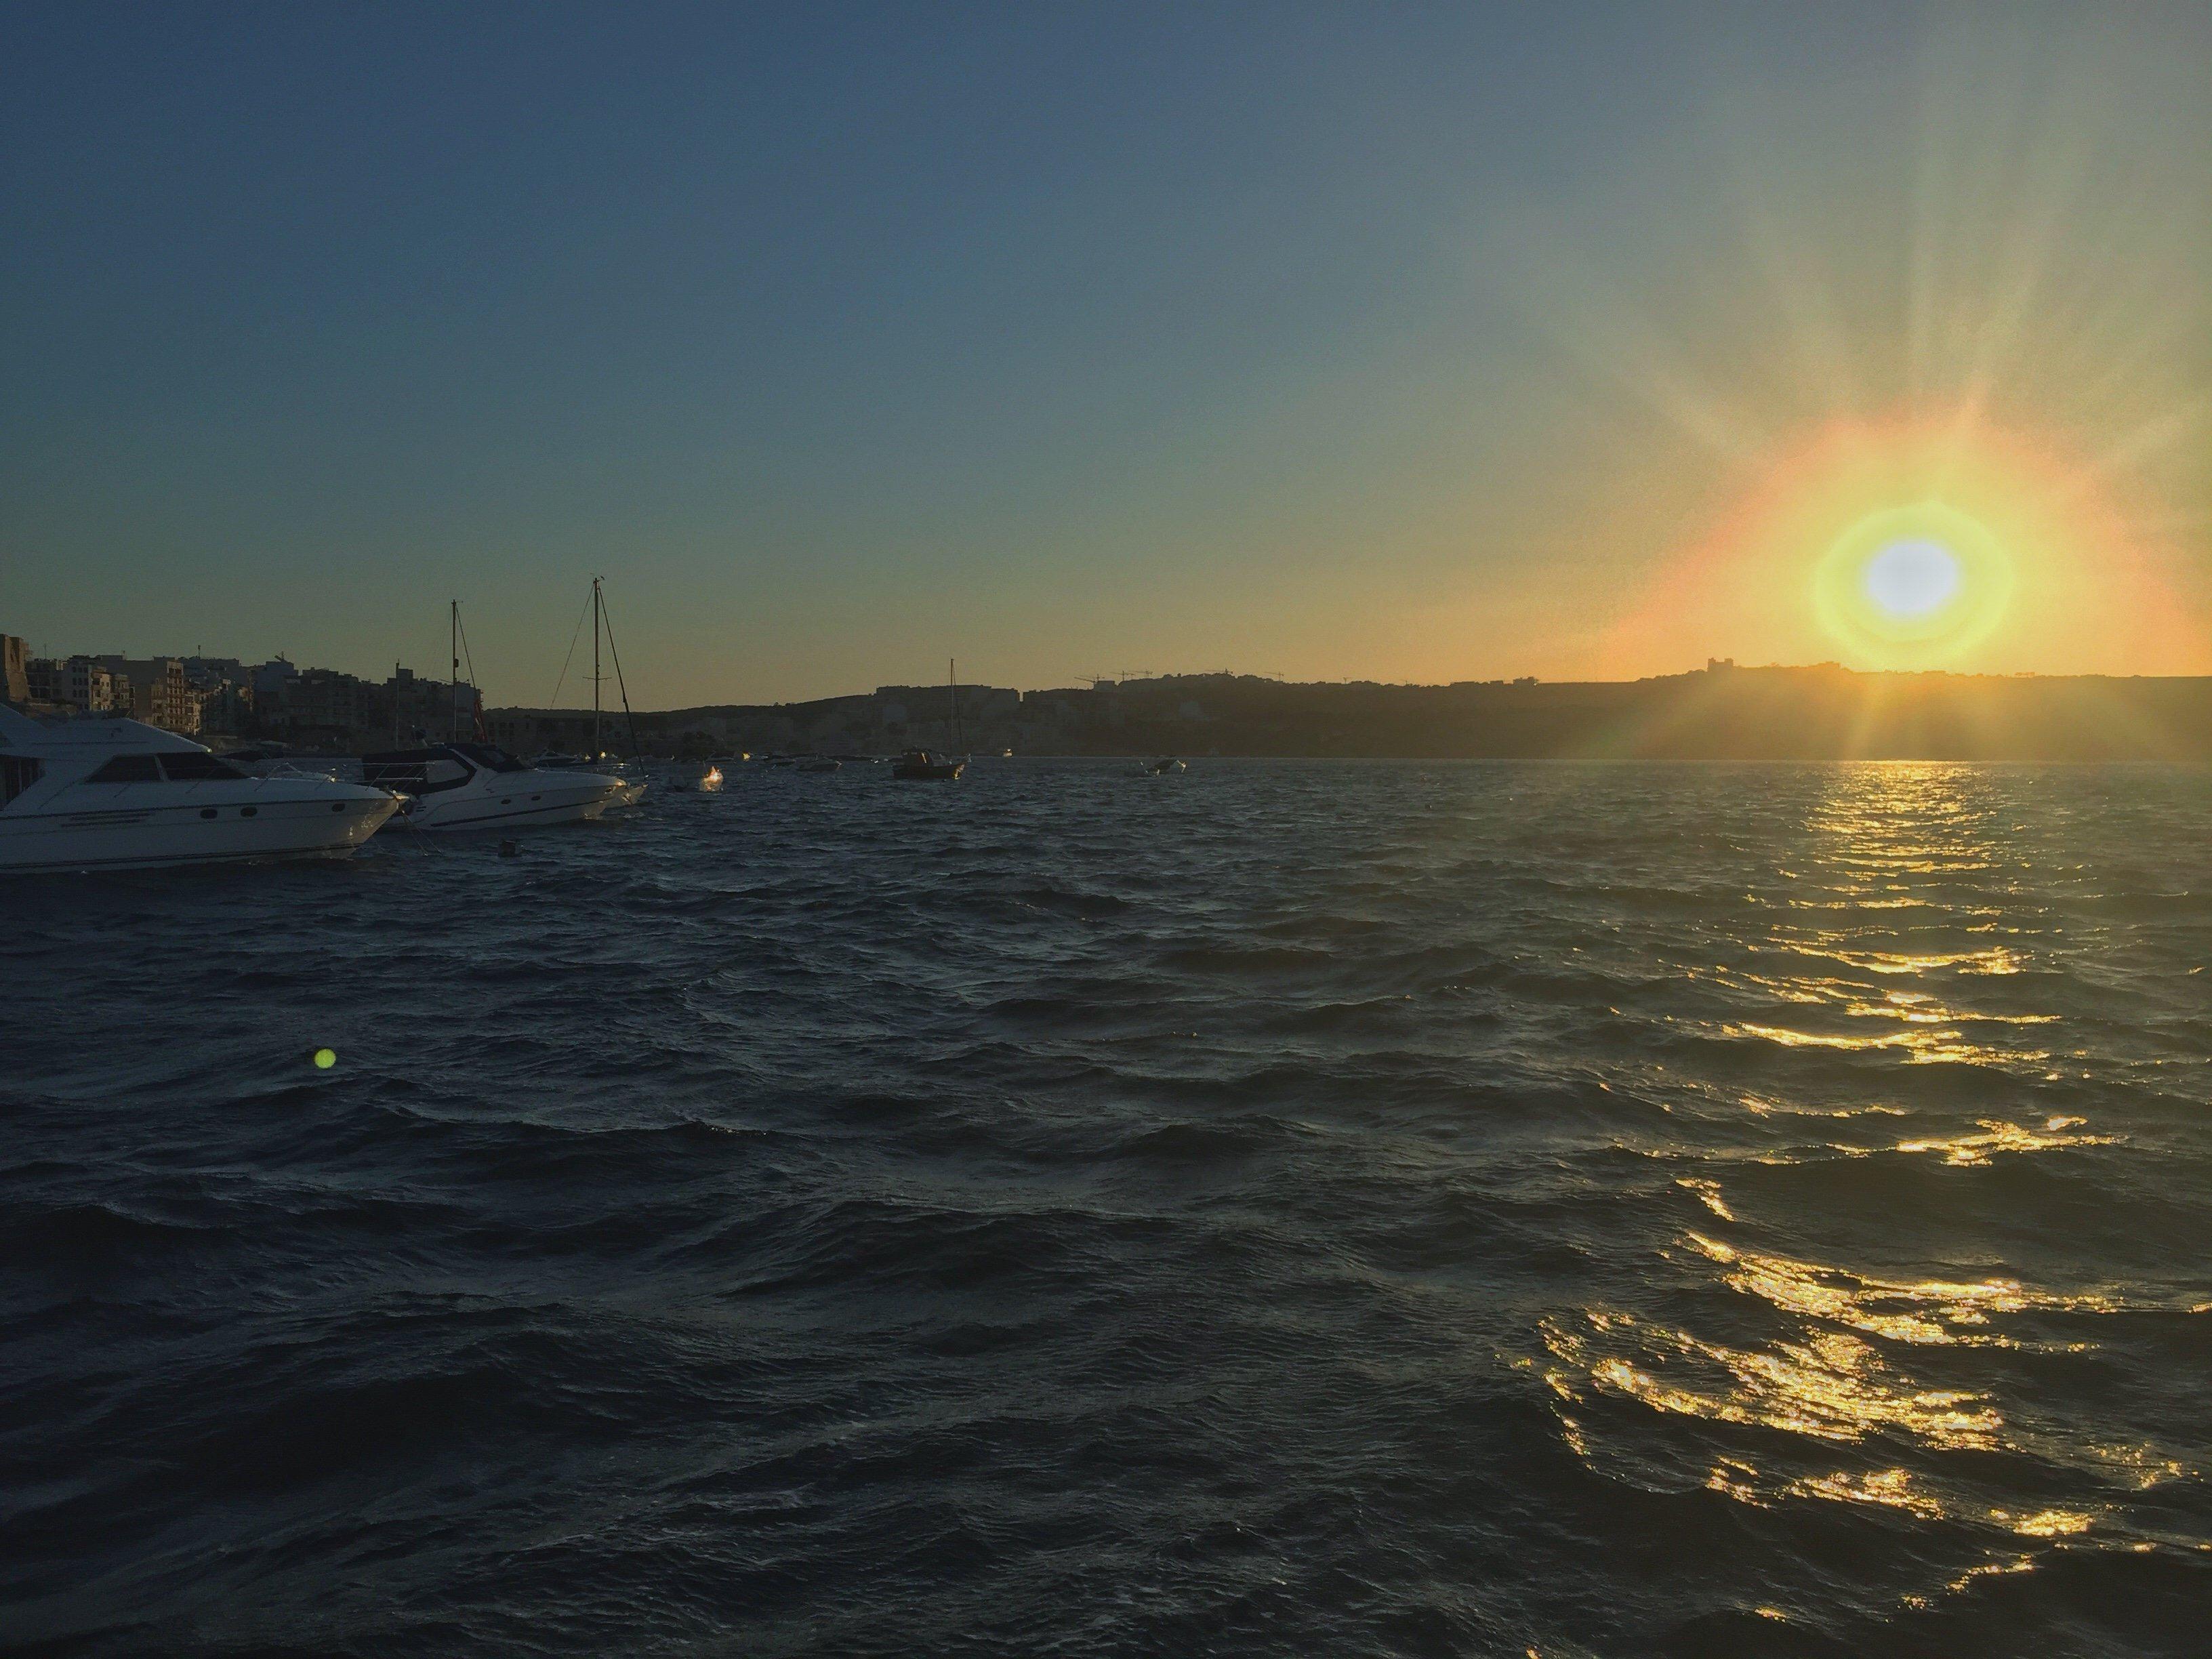 sunset, Malta, sea, boats